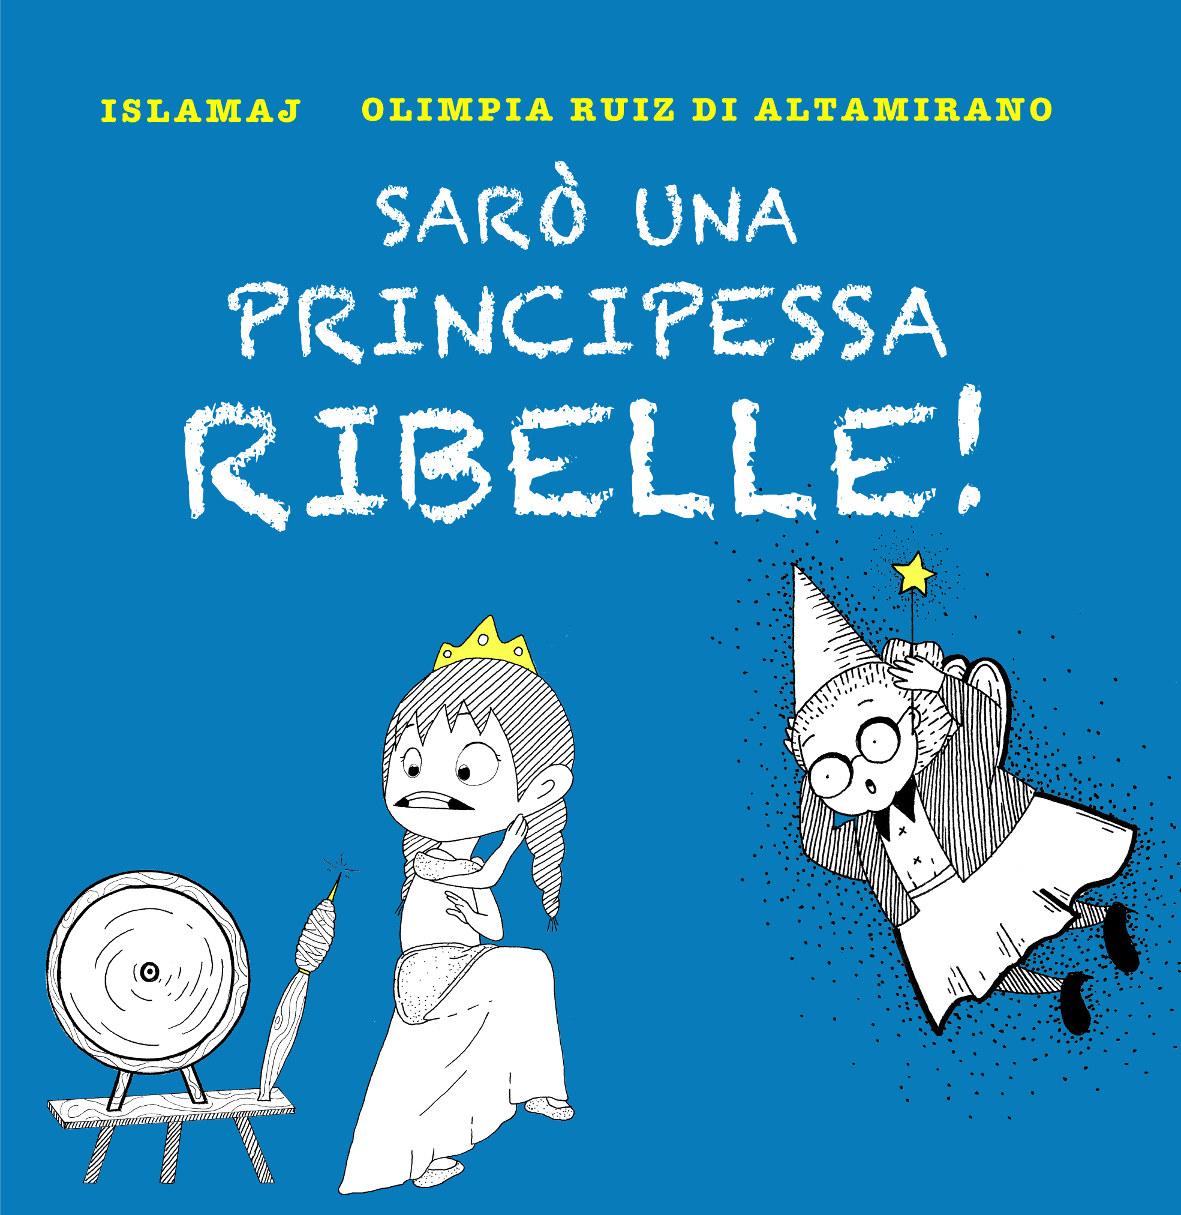 Sarò una principessa ribelle!